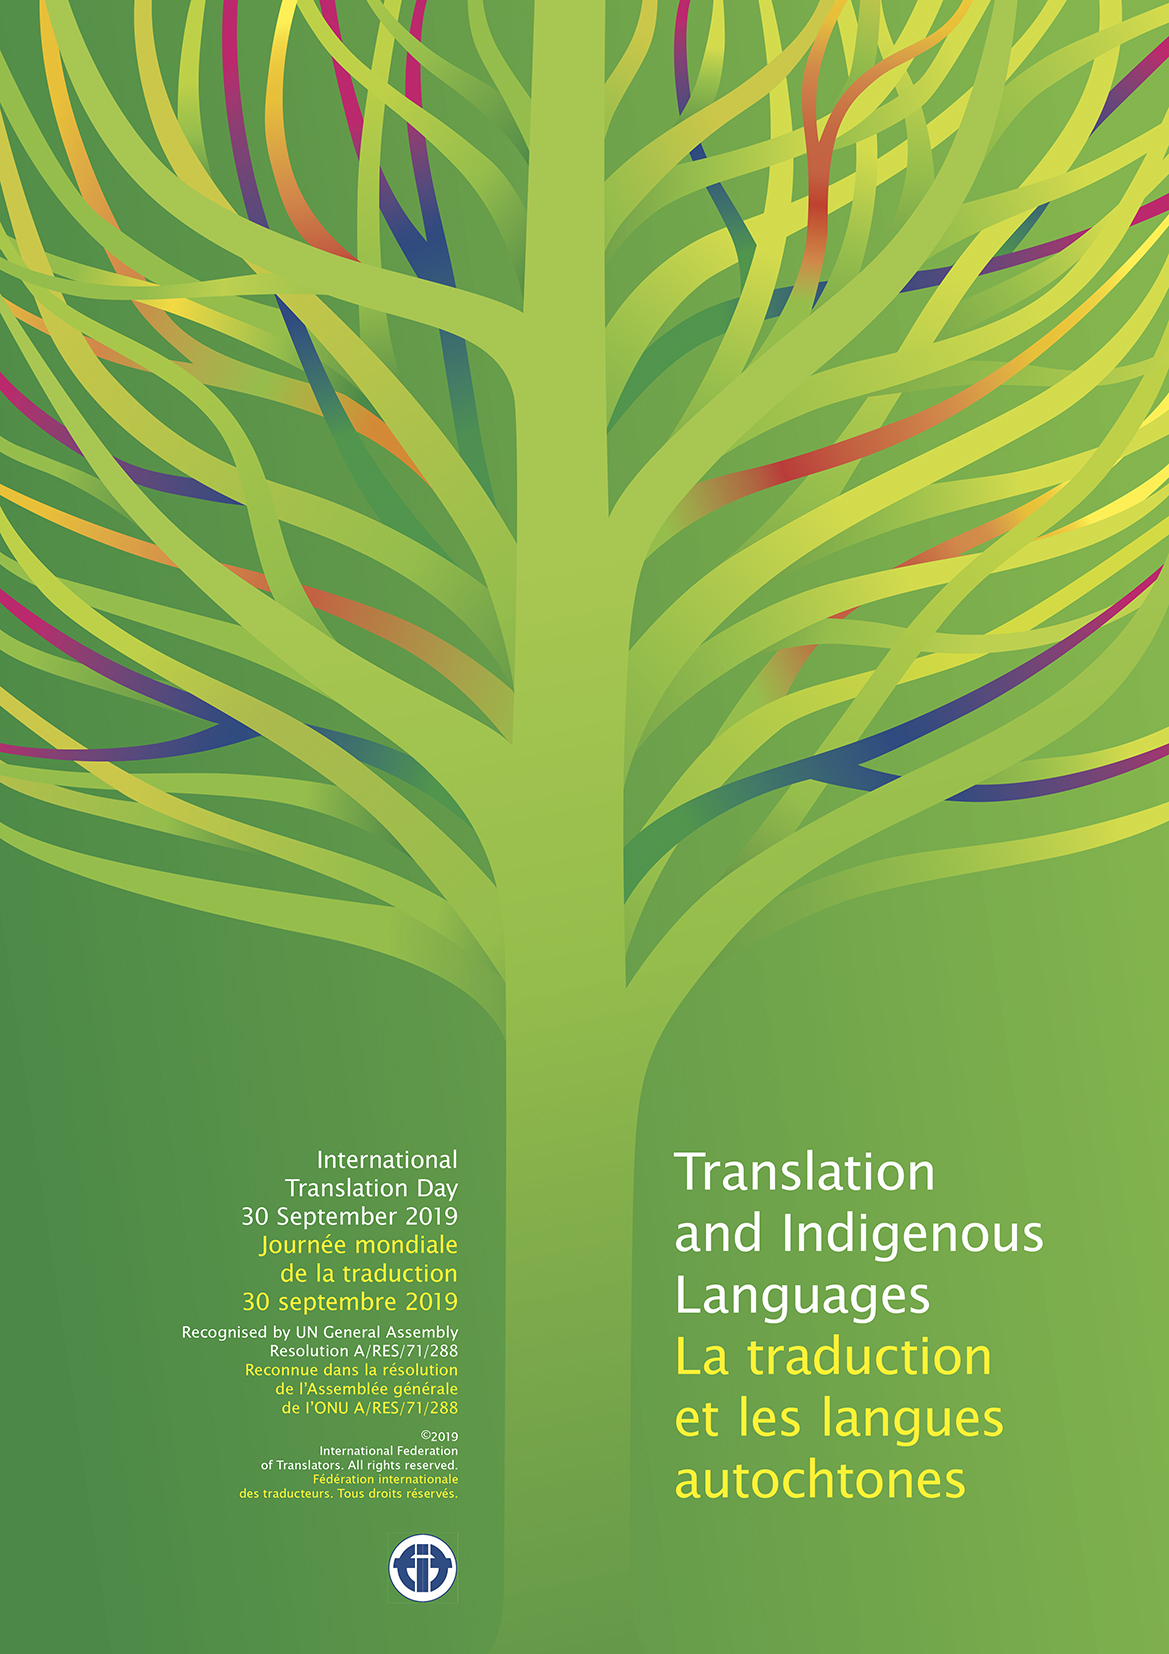 dia internacional del traductor